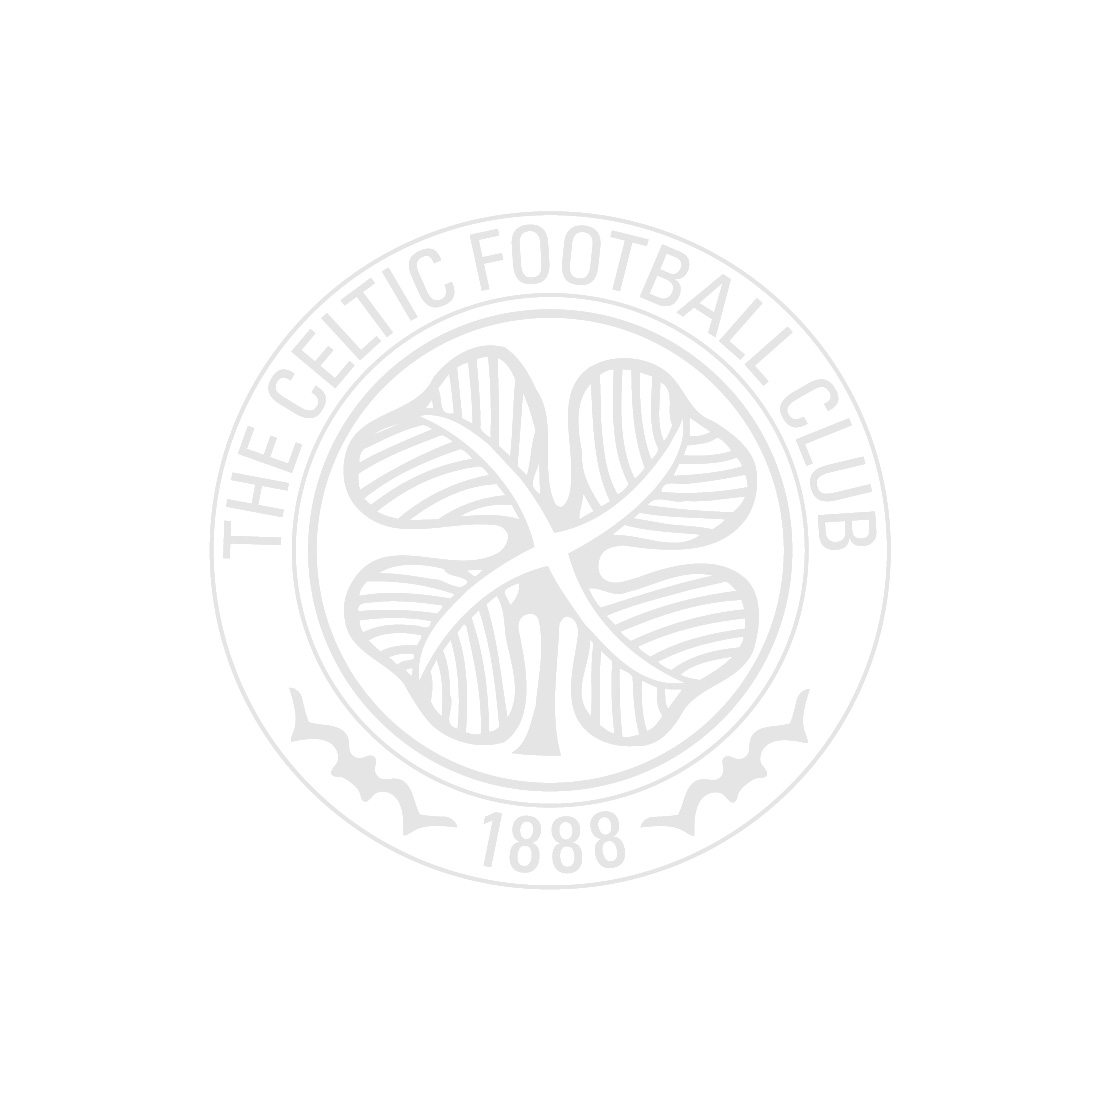 Celtic FC Wristband